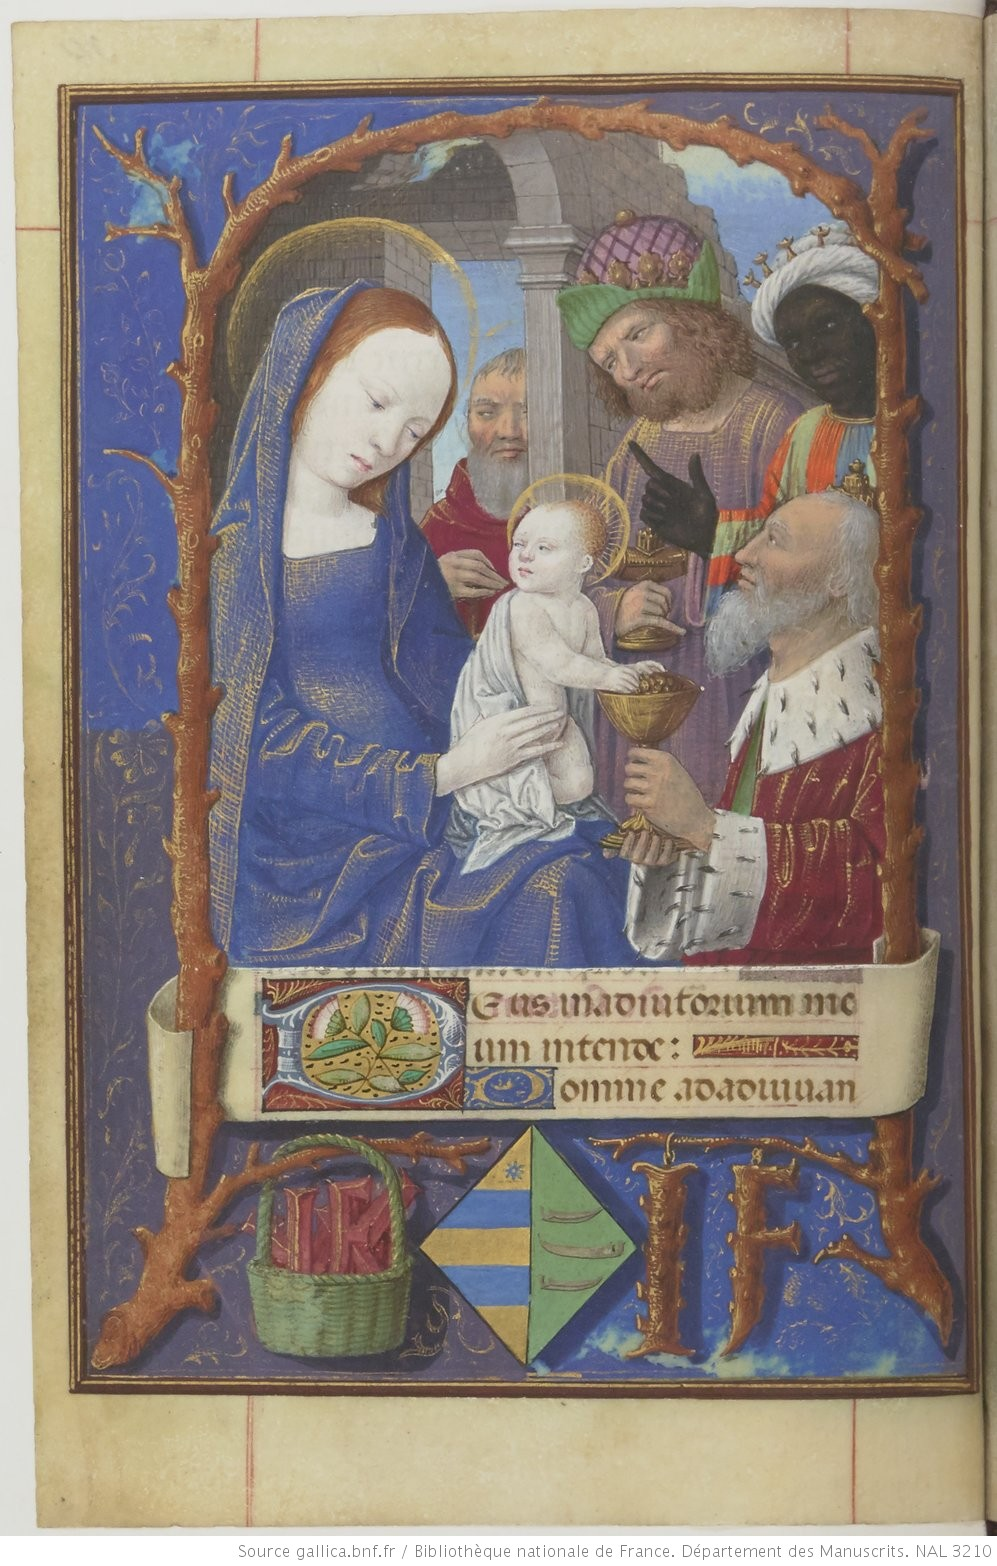 1483-1503 Horae ad usum Romanum NAL 3210 fol 34v